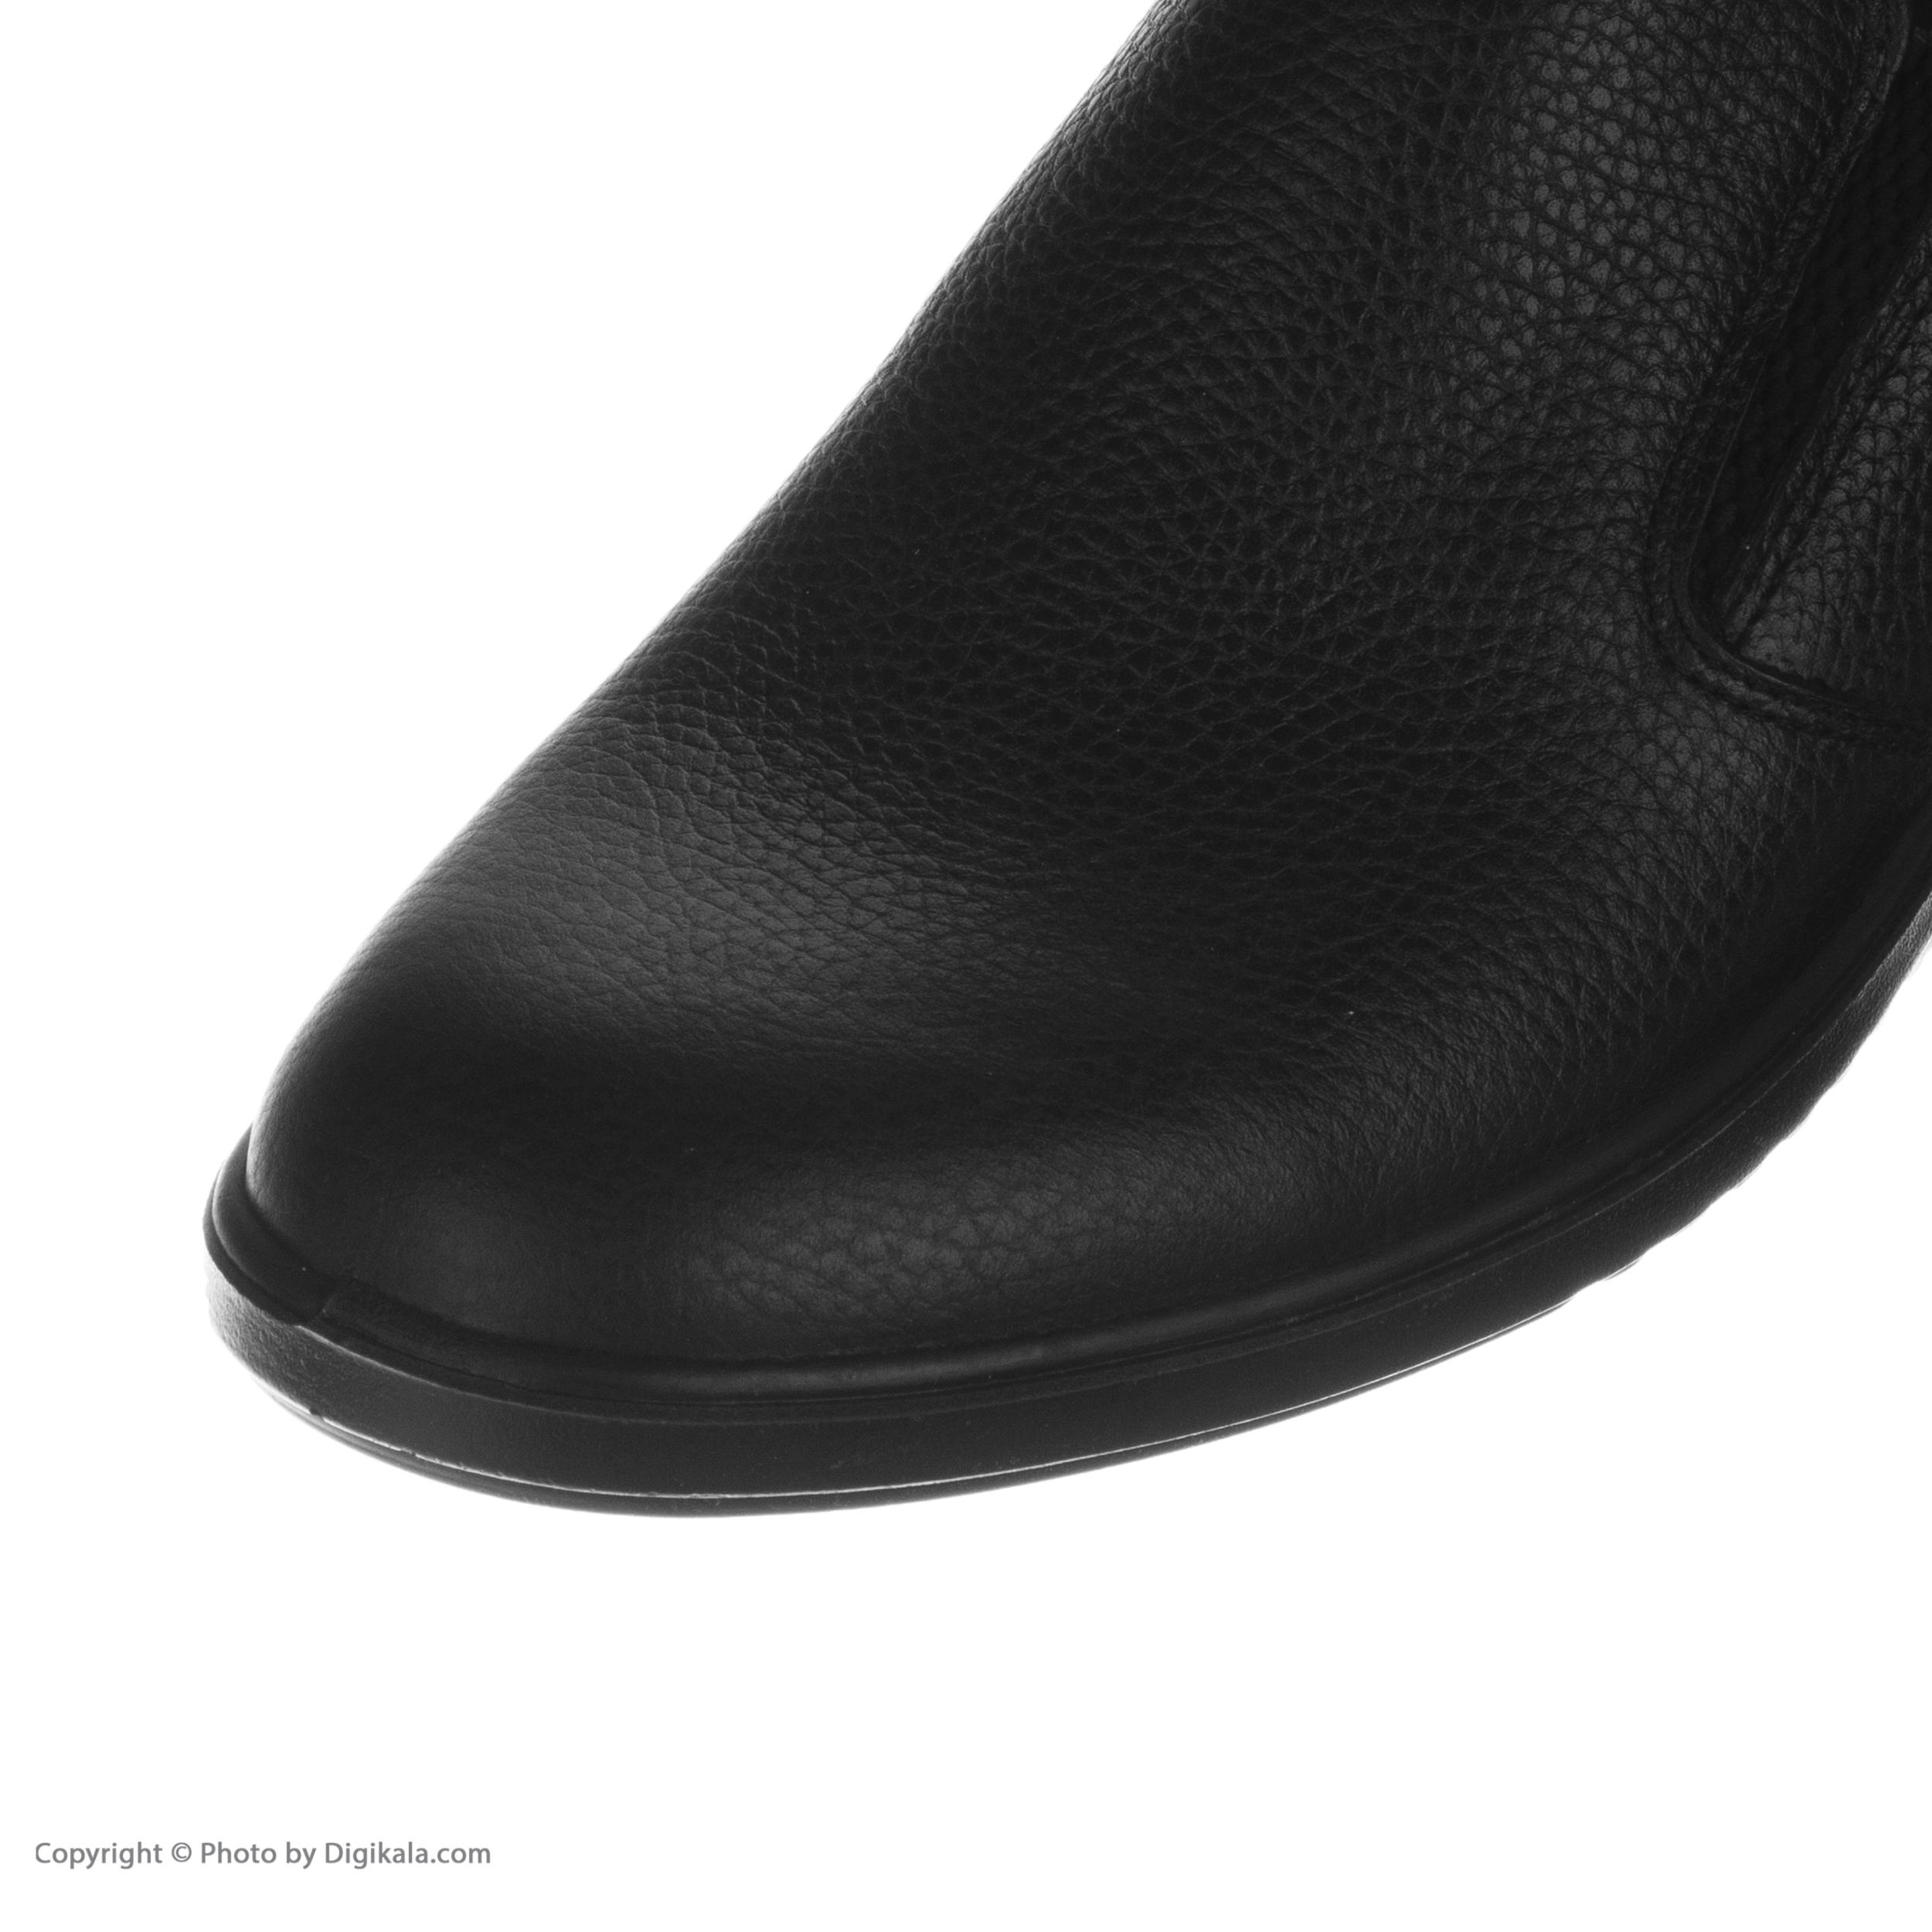 کفش روزمره مردانه ریمکس مدل 7327A503101 -  - 8